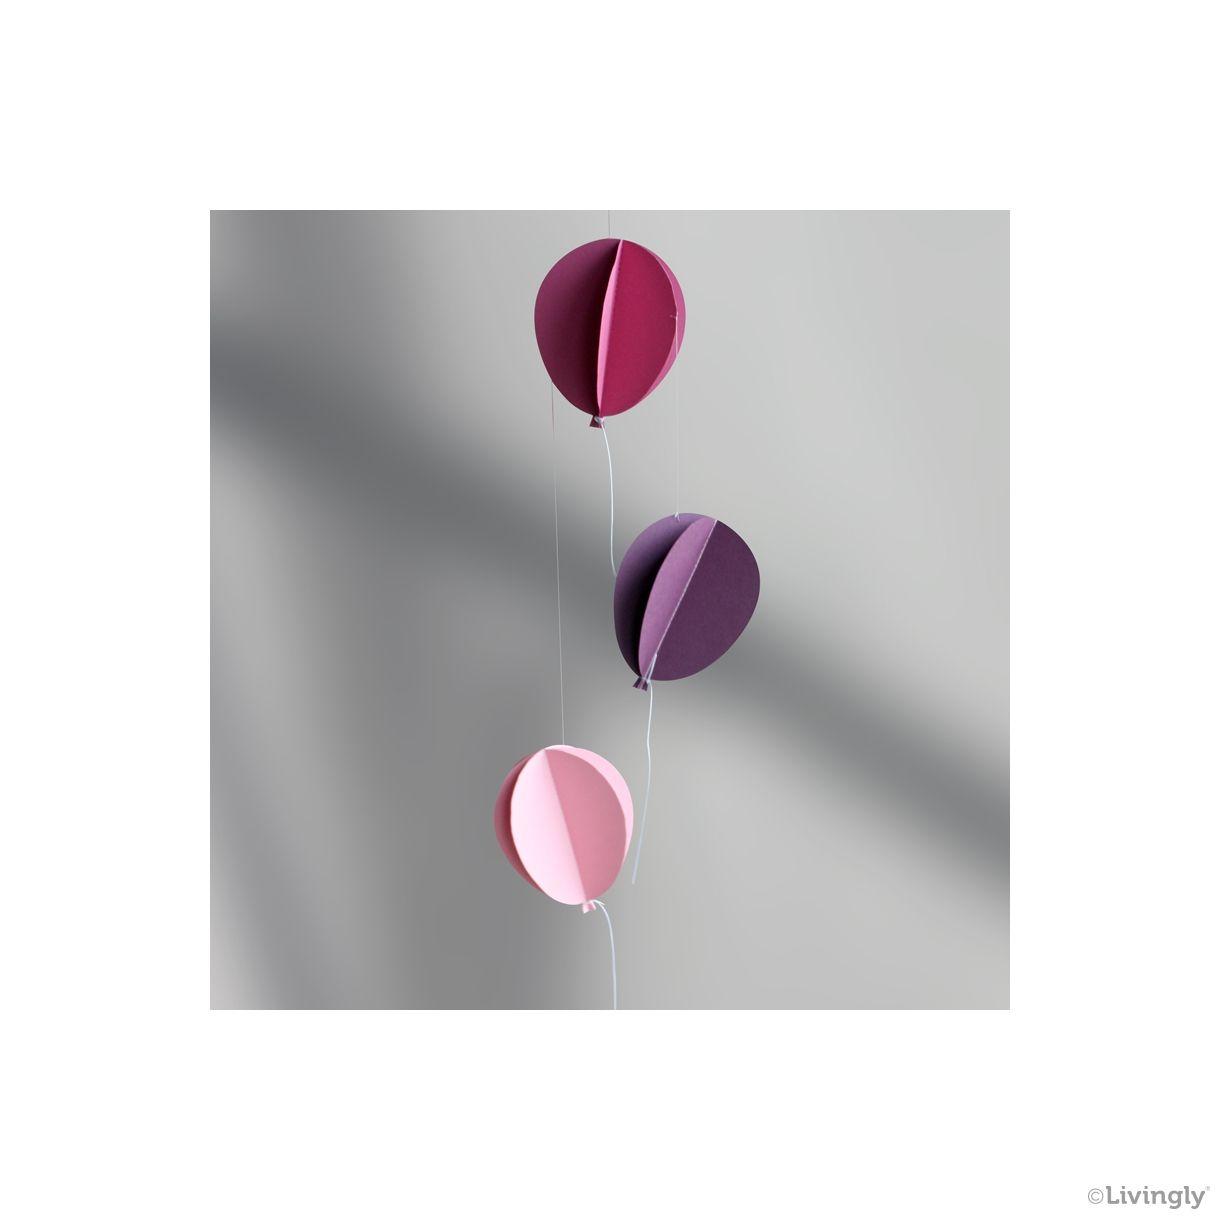 Tivoli Ballon mobile lyserød 40 cm - TIVOLI - Livingly Paper Craft and Mobiles